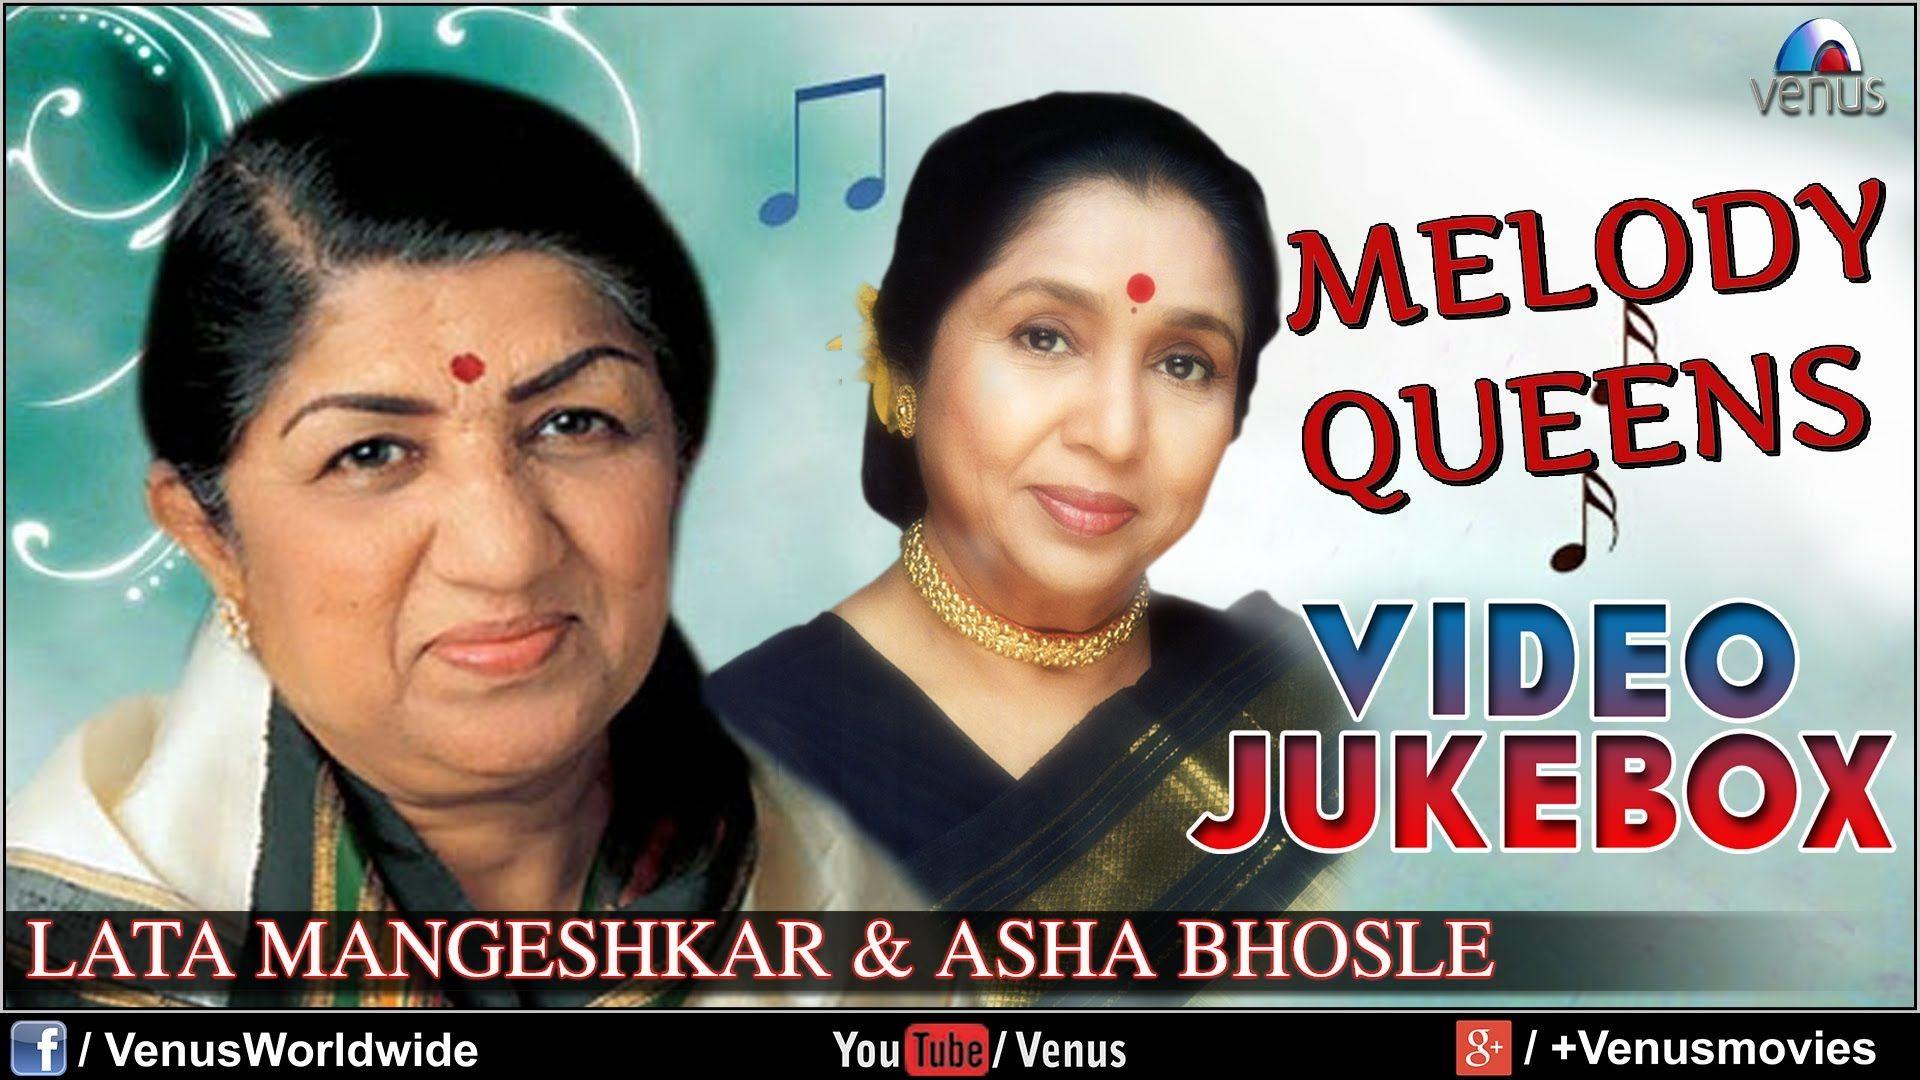 Pin by slim on hindi song videos pinterest koi songs and singers nvjuhfo Choice Image